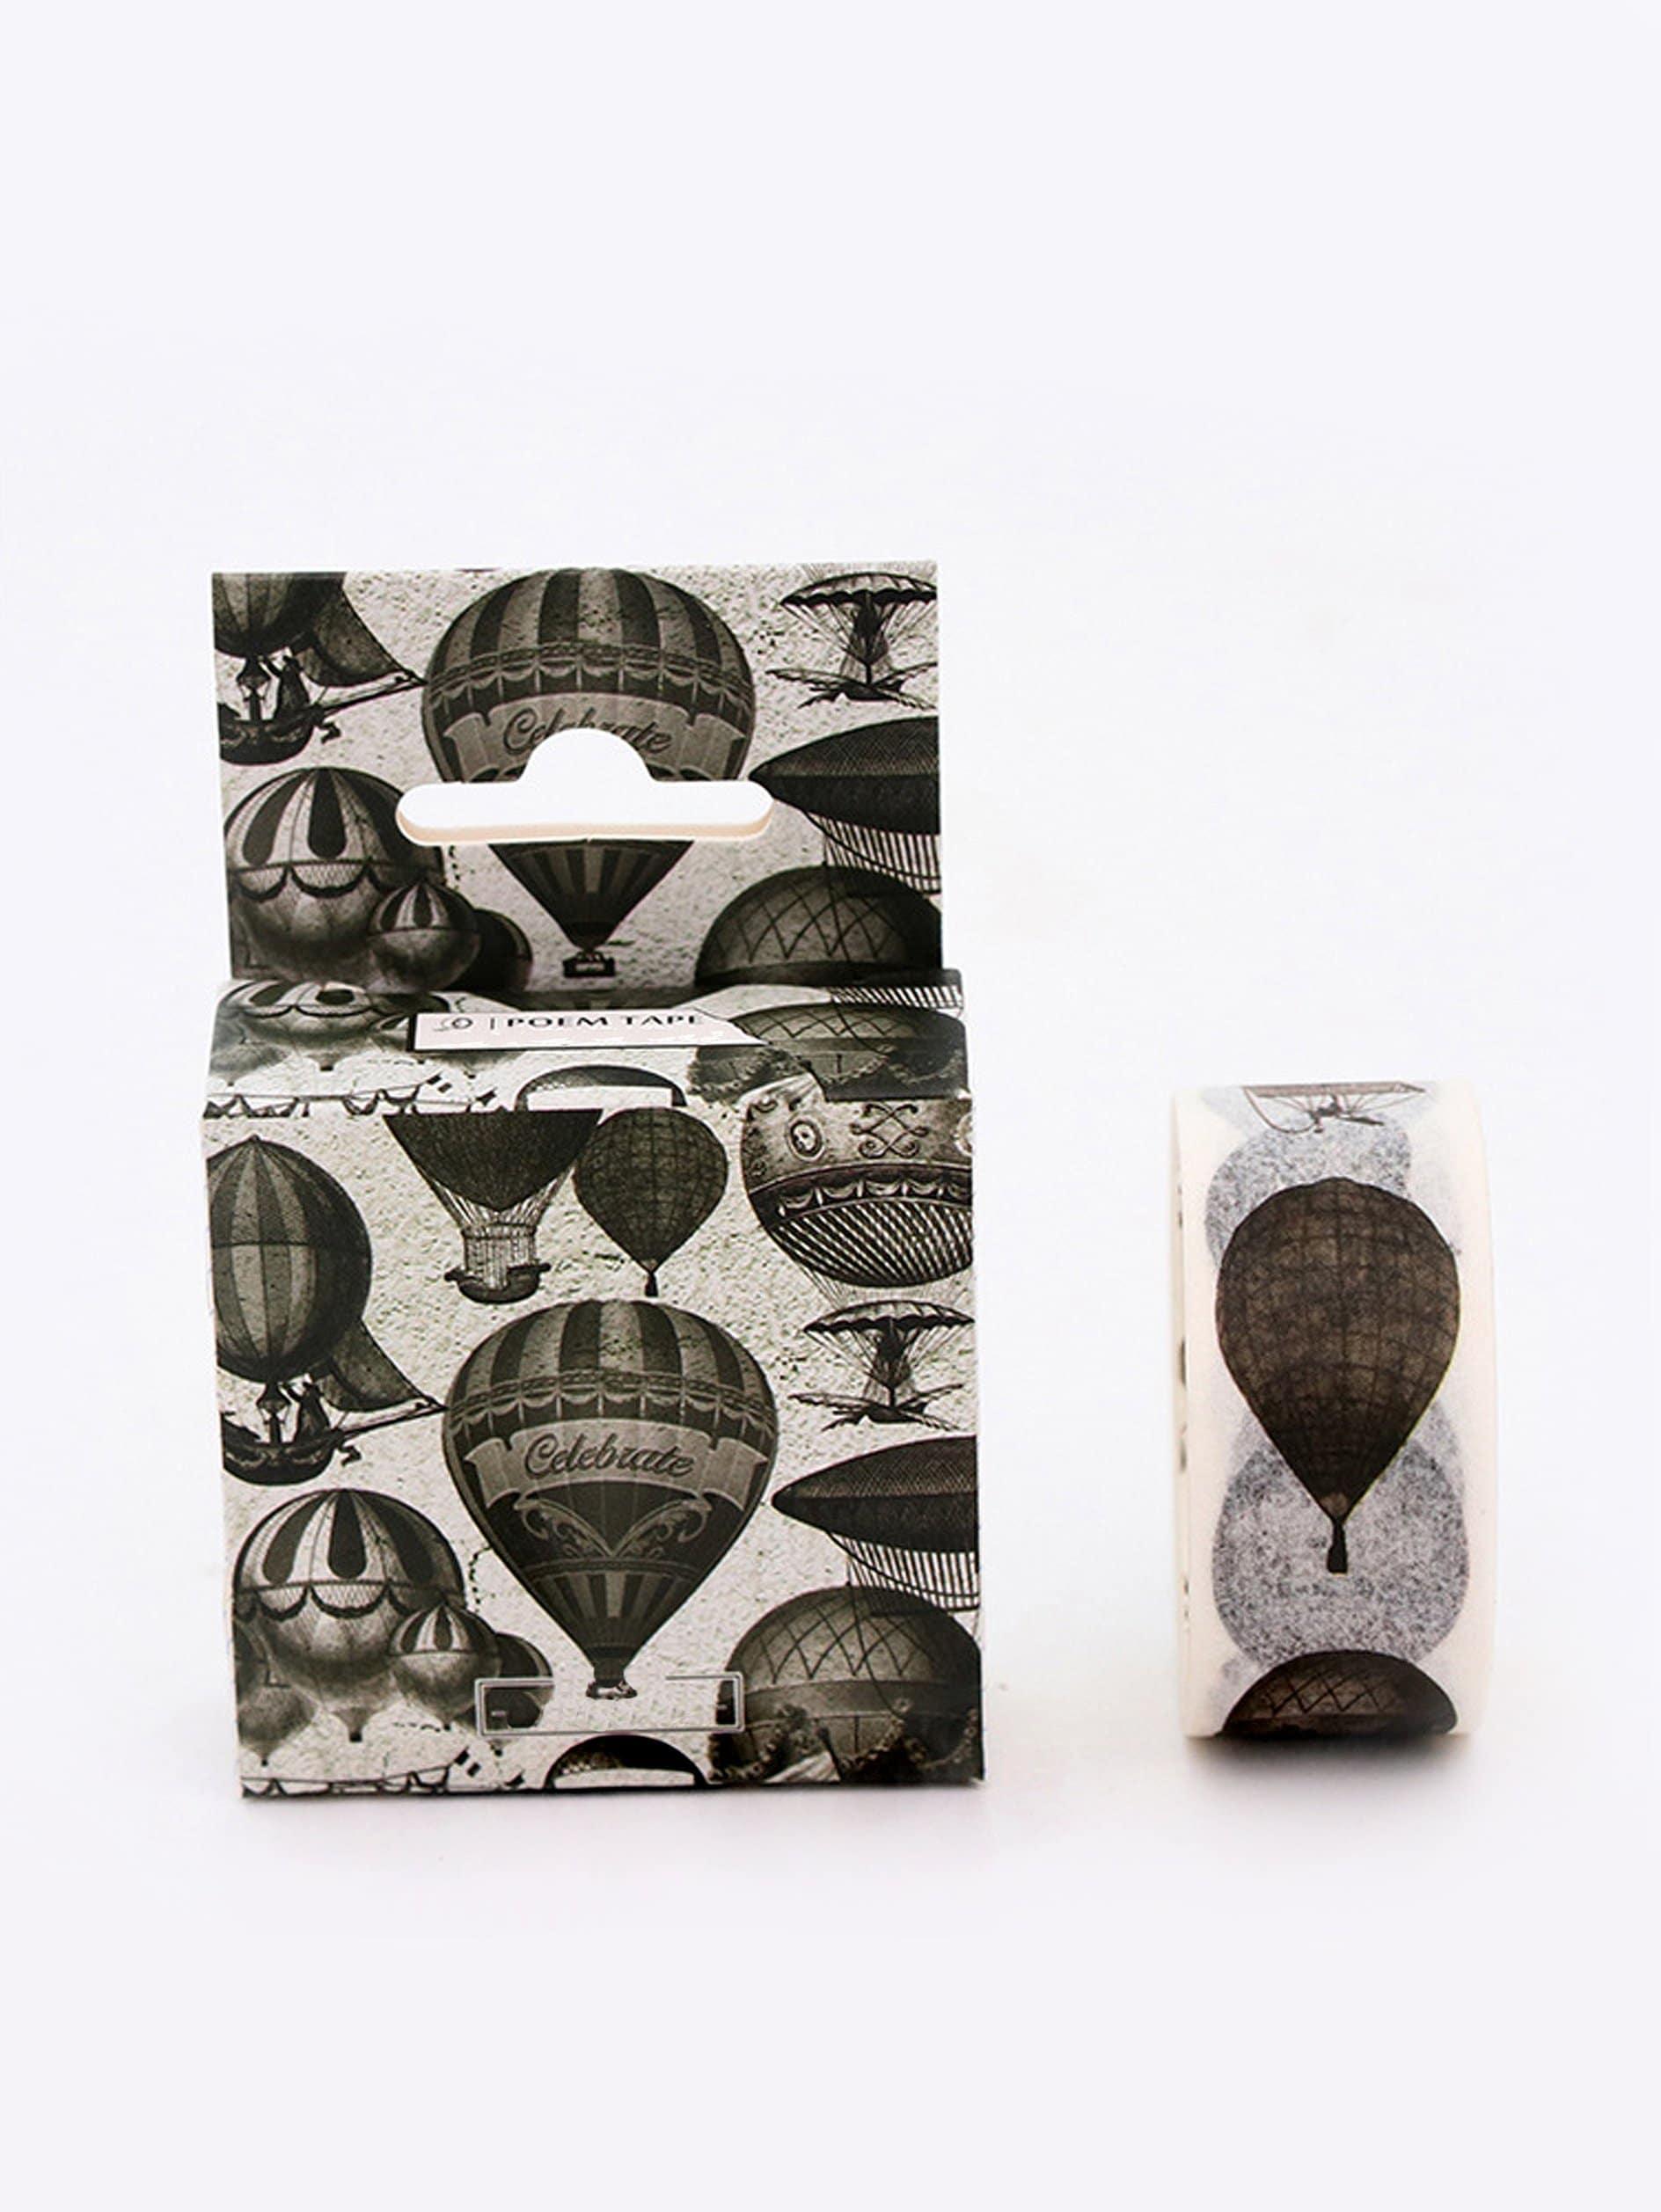 Hot Air Balloon Printed Masking Tape